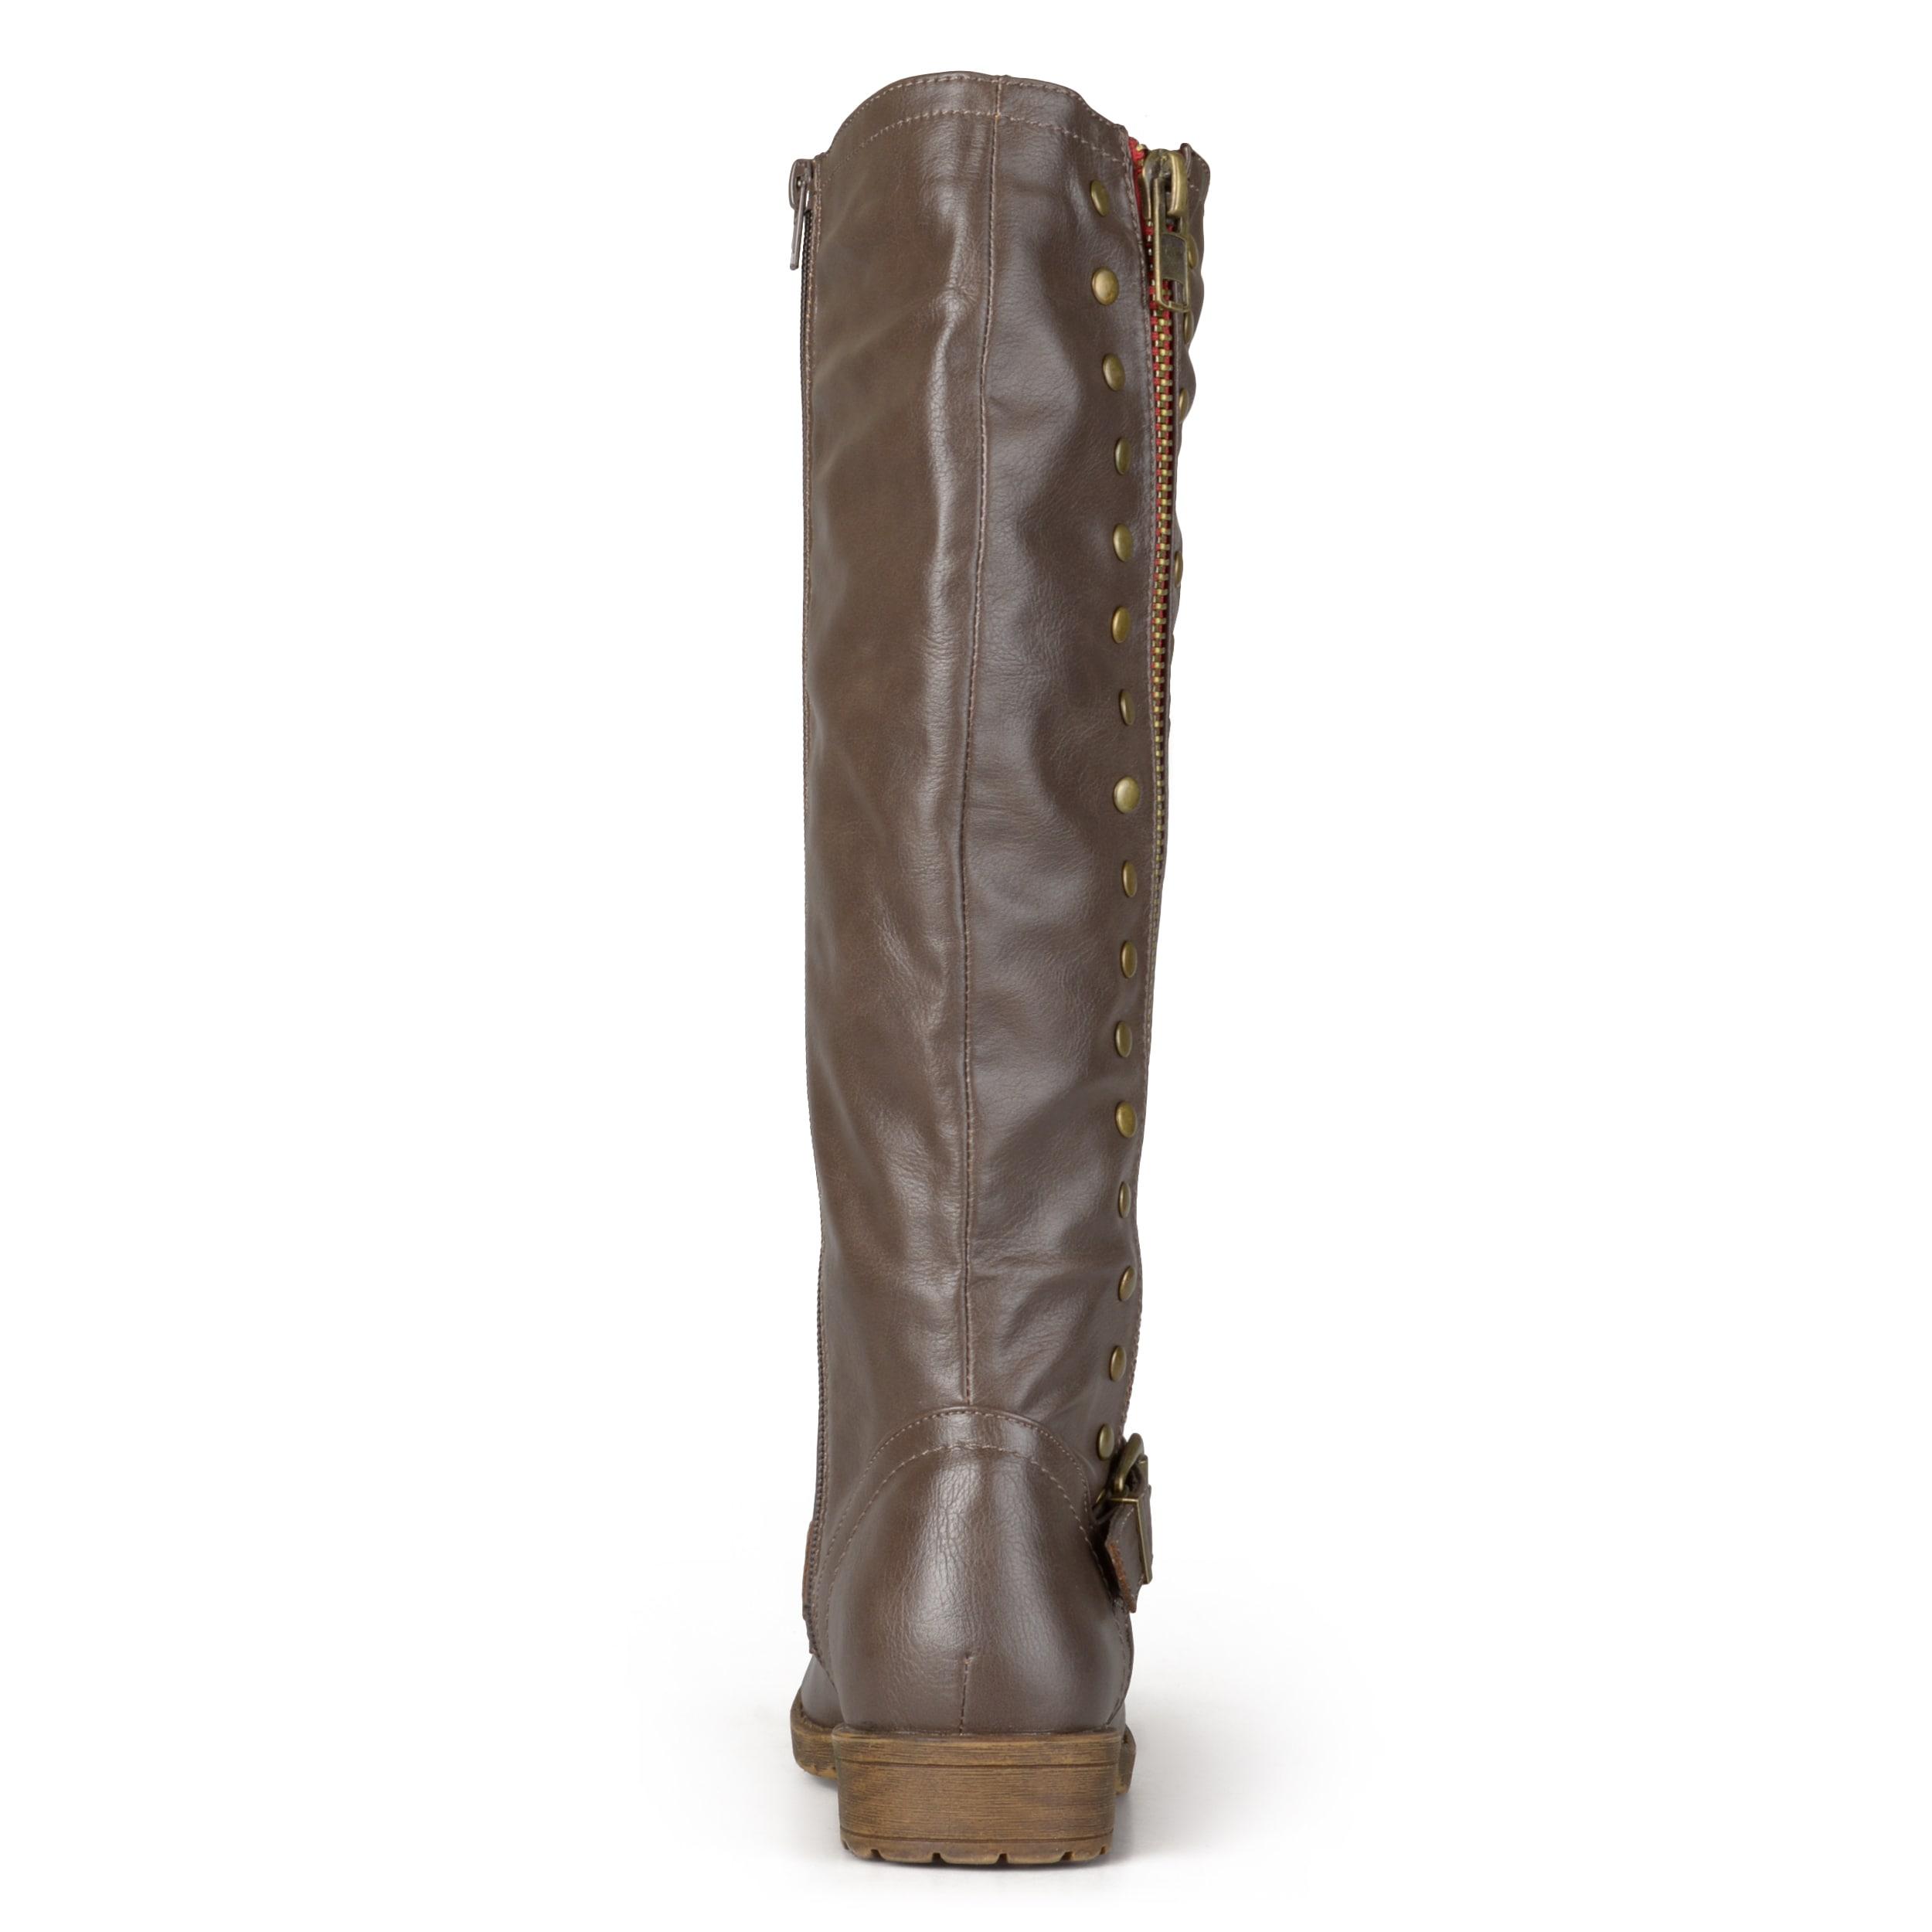 0a5bbb73d681 Shop Journee Collection Women s  Tilt  Regular and Wide Calf Studded Zipper Riding  Boots - Free Shipping Today - Overstock.com - 10511472